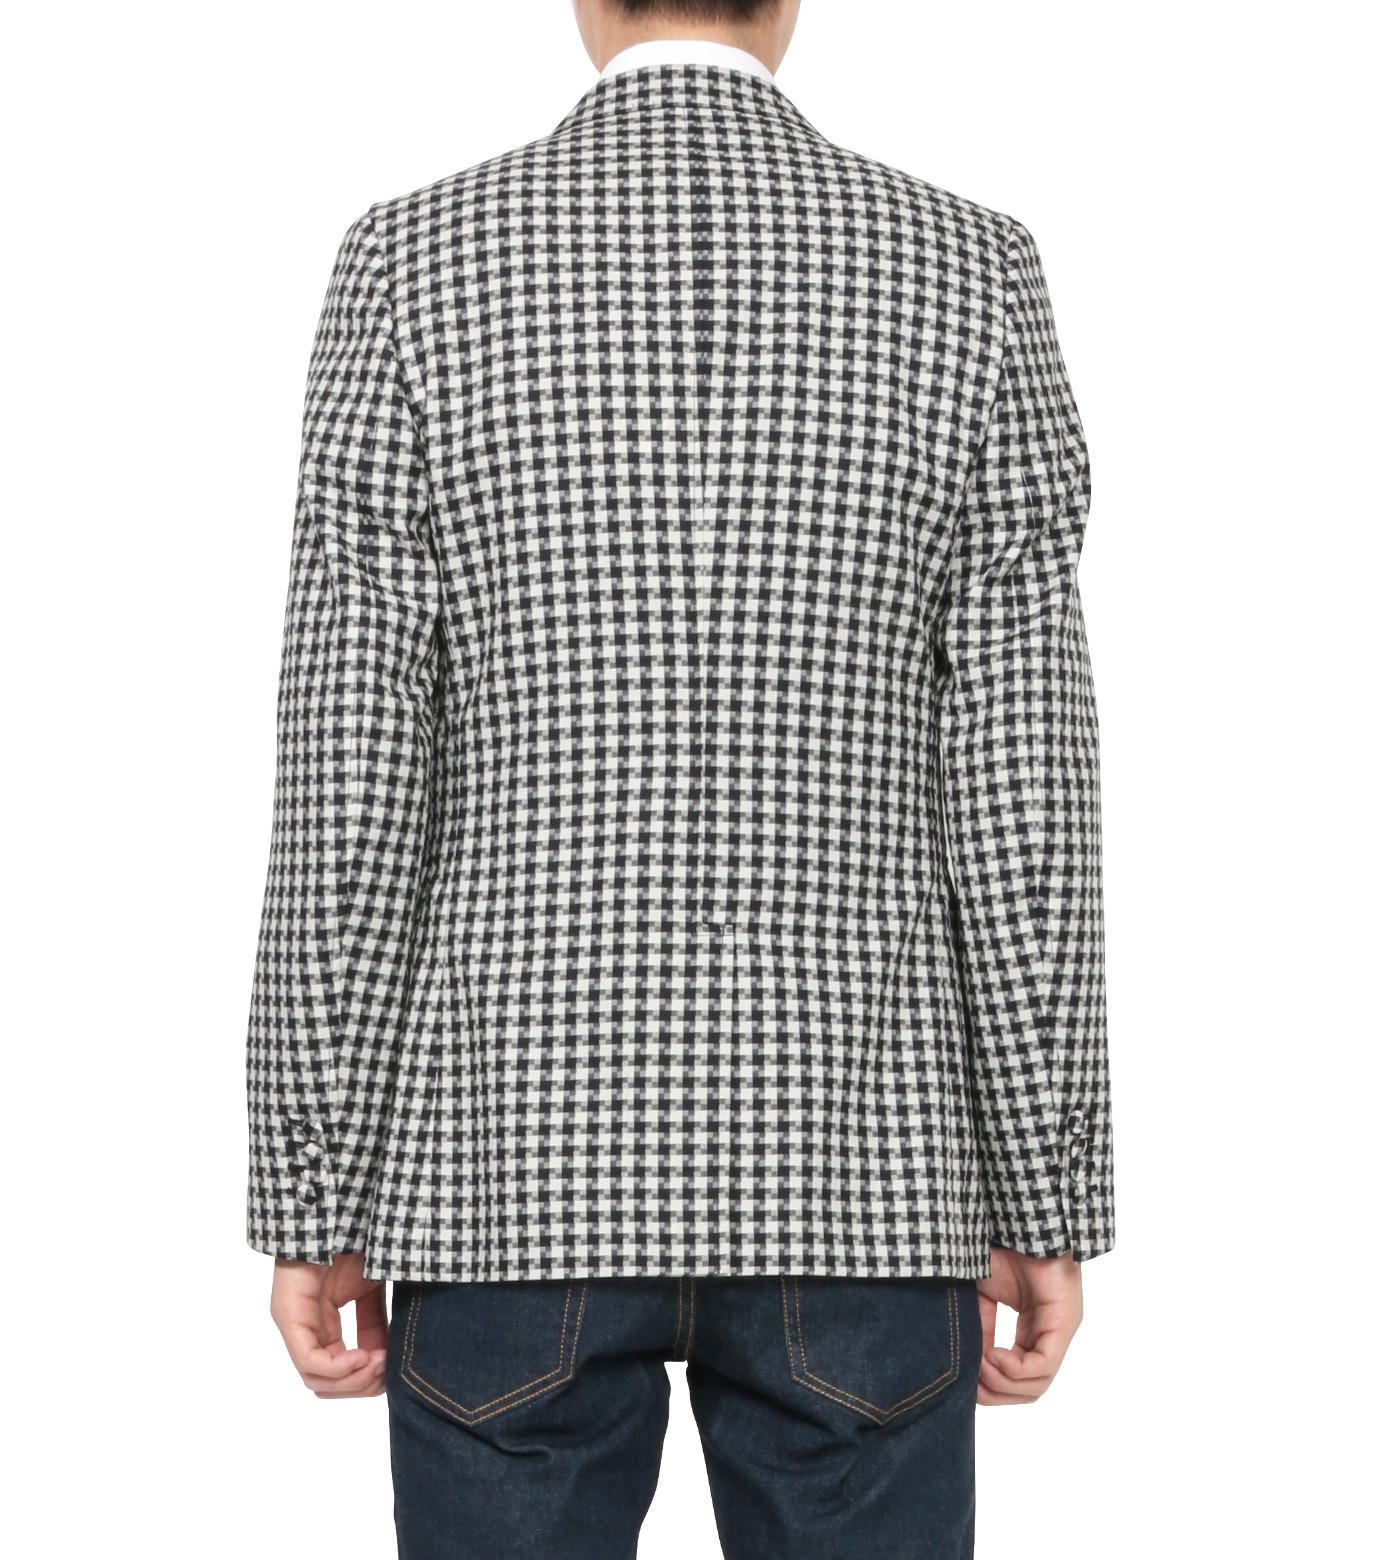 MAISON KITSUNÉ(メゾンキツネ)のSheepherds Check Jacket-BLACK(ジャケット/jacket)-KMV0503-13 拡大詳細画像2